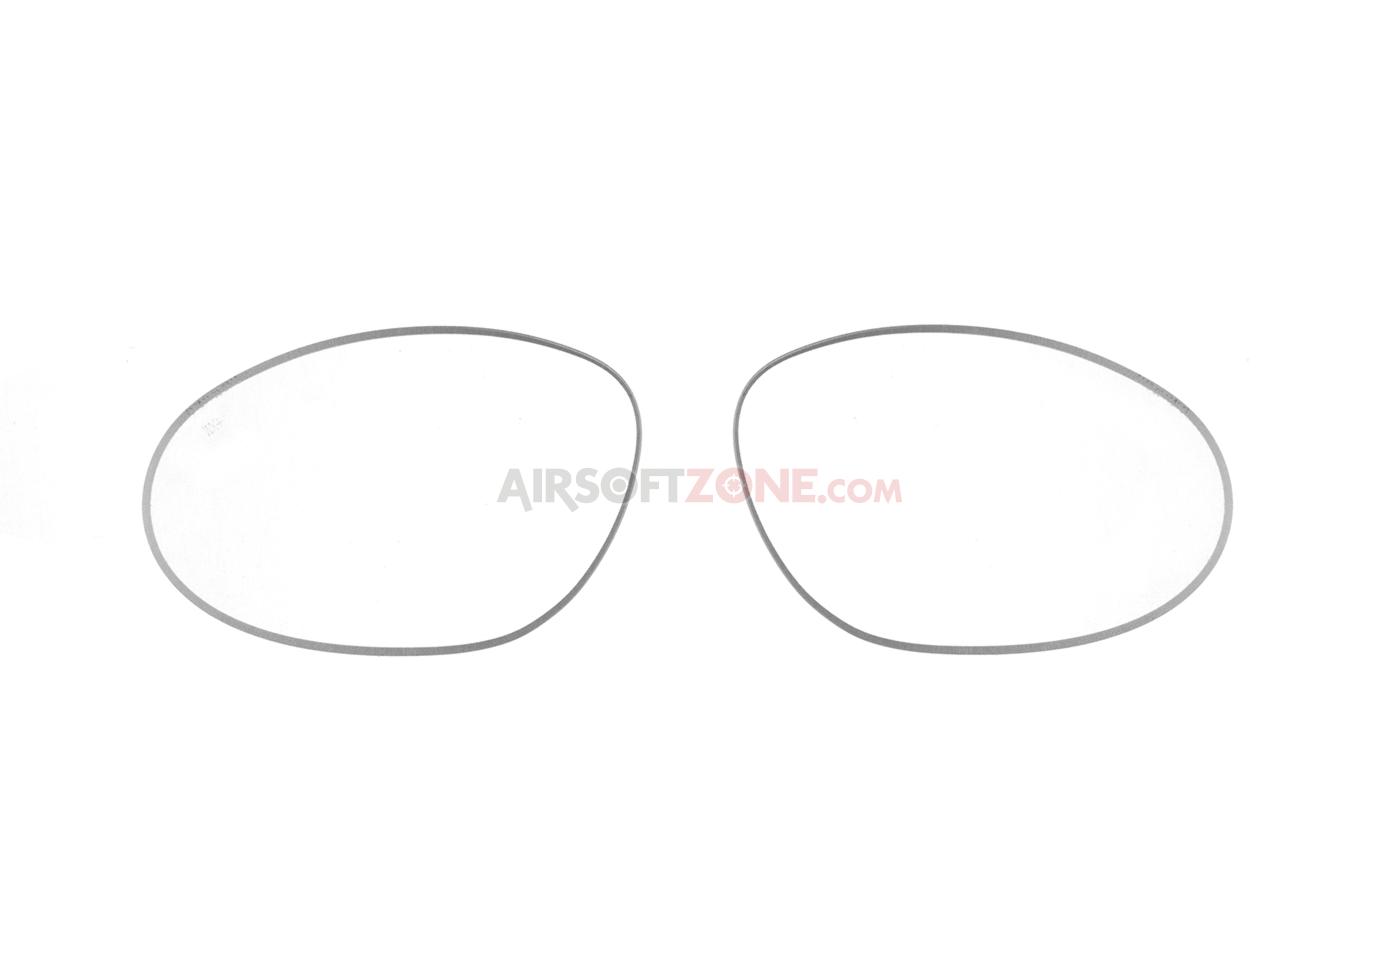 38d0ca3bd XL-1 Advanced Goggles Lens Clear (Wiley X) - Glasses - Eyewear ...